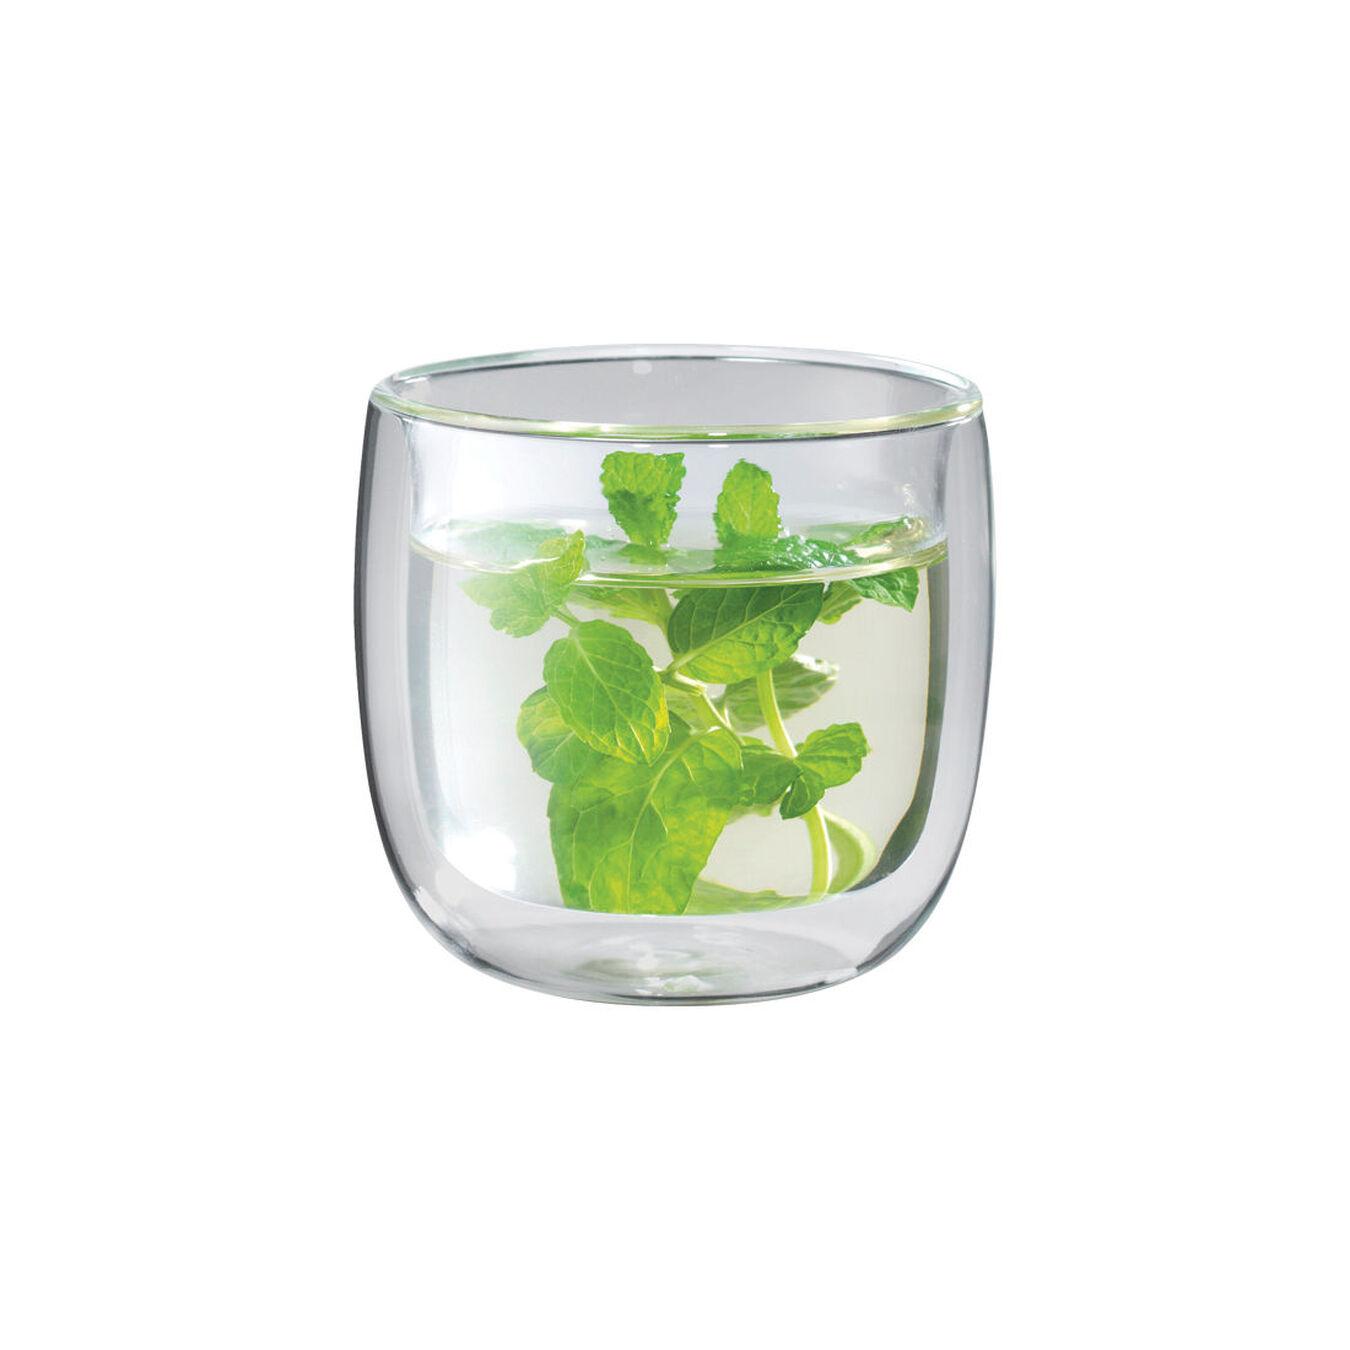 2-pc Tea glass set, Double wall glas ,,large 1